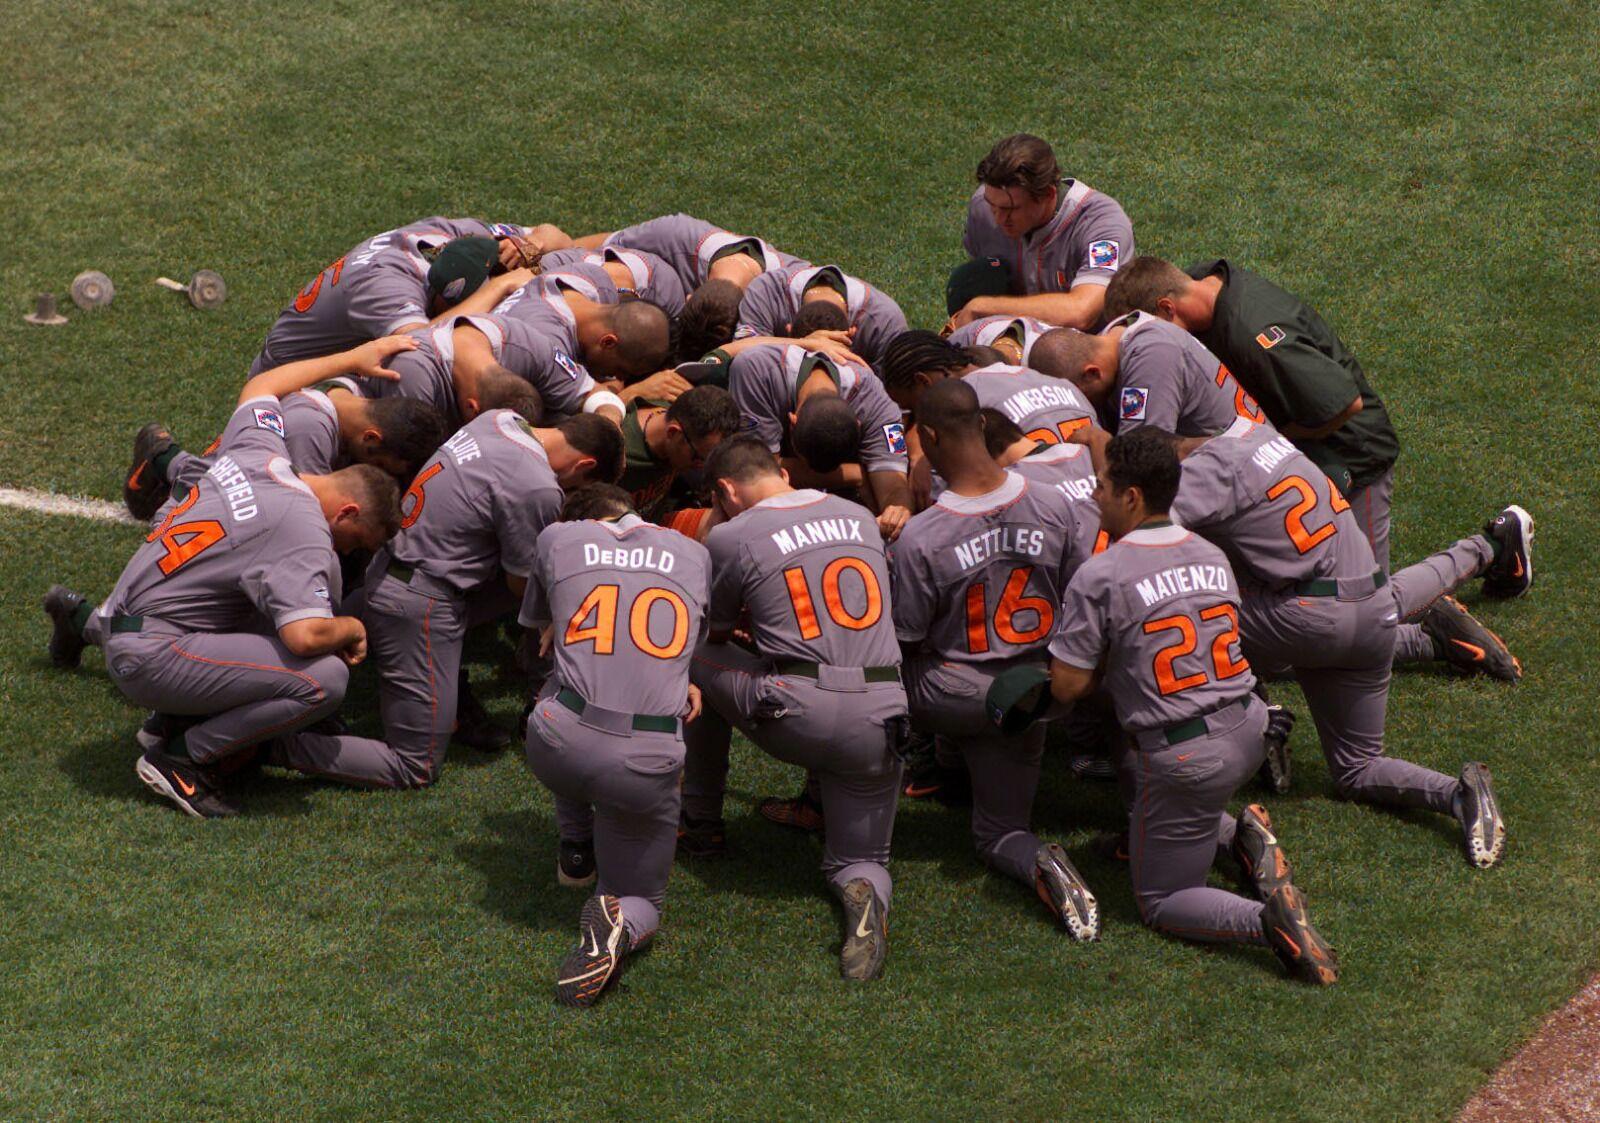 Miami baseball players drafted by MLB won't hurt Hurricanes future